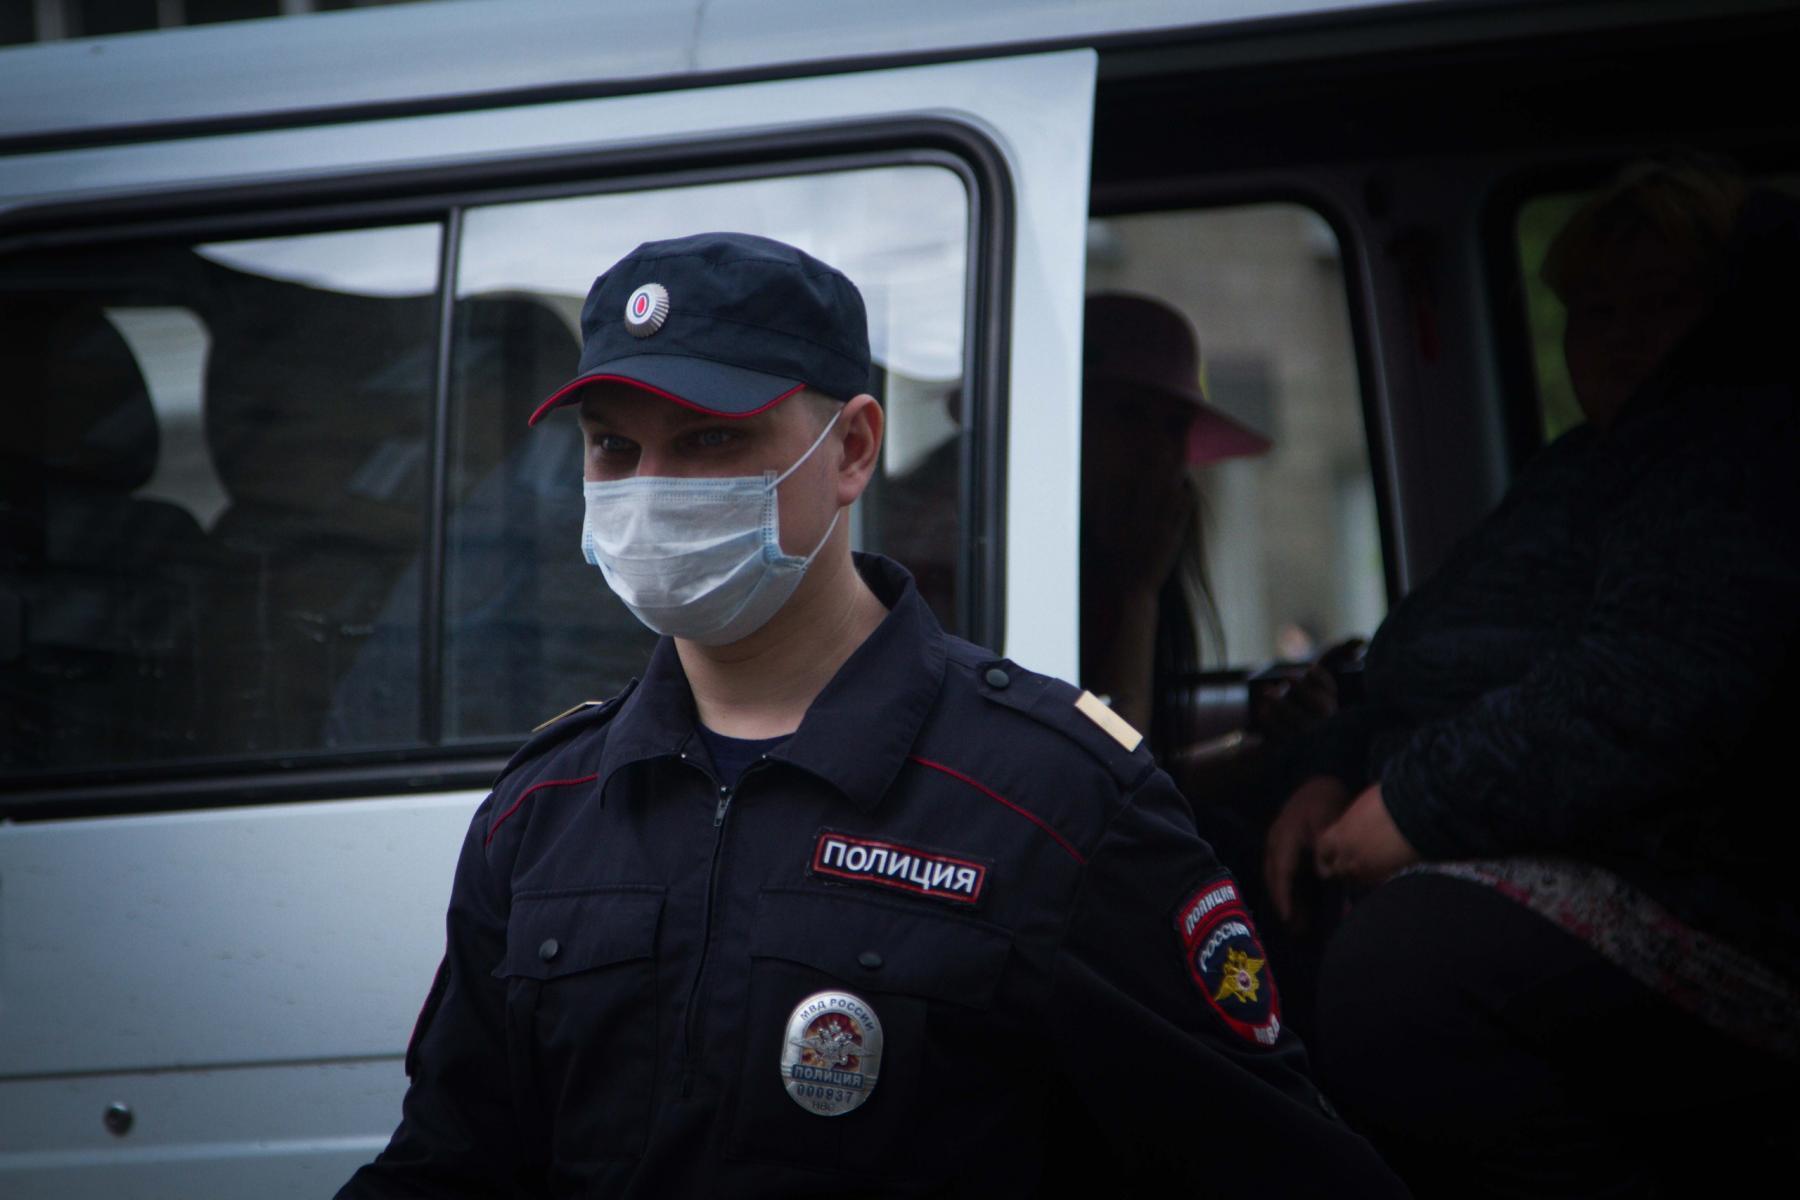 фото Дело в маске: новосибирец заплатил за проезд в автобусе 1000 рублей 2